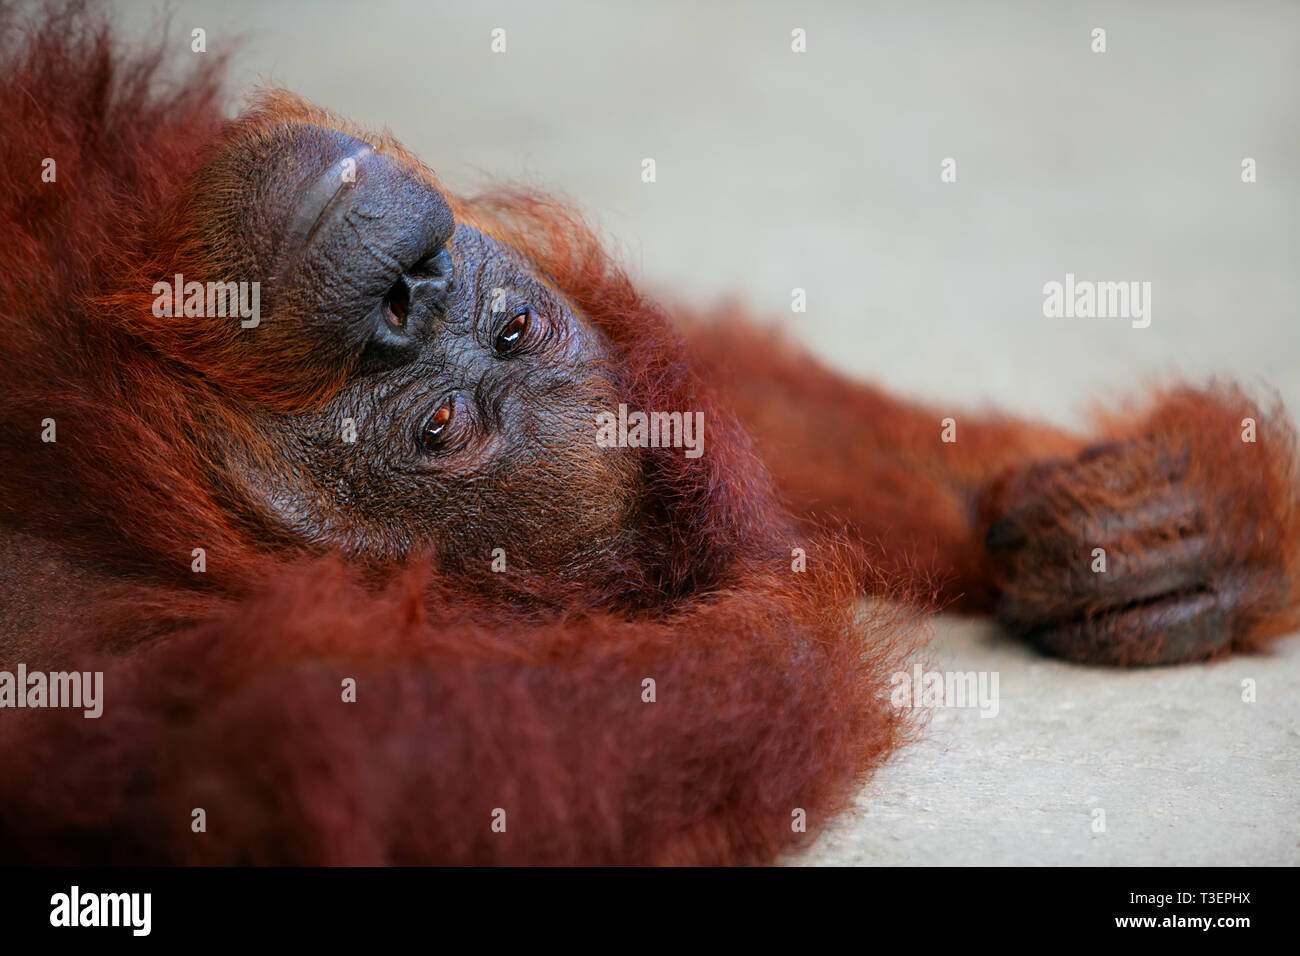 Wild Bornean orangutan at Semenggoh Nature Reserve, Wildlife Rehabilitation Centre in Kuching. Orangutans are endangered apes inhabiting rainforests o Stock Photo